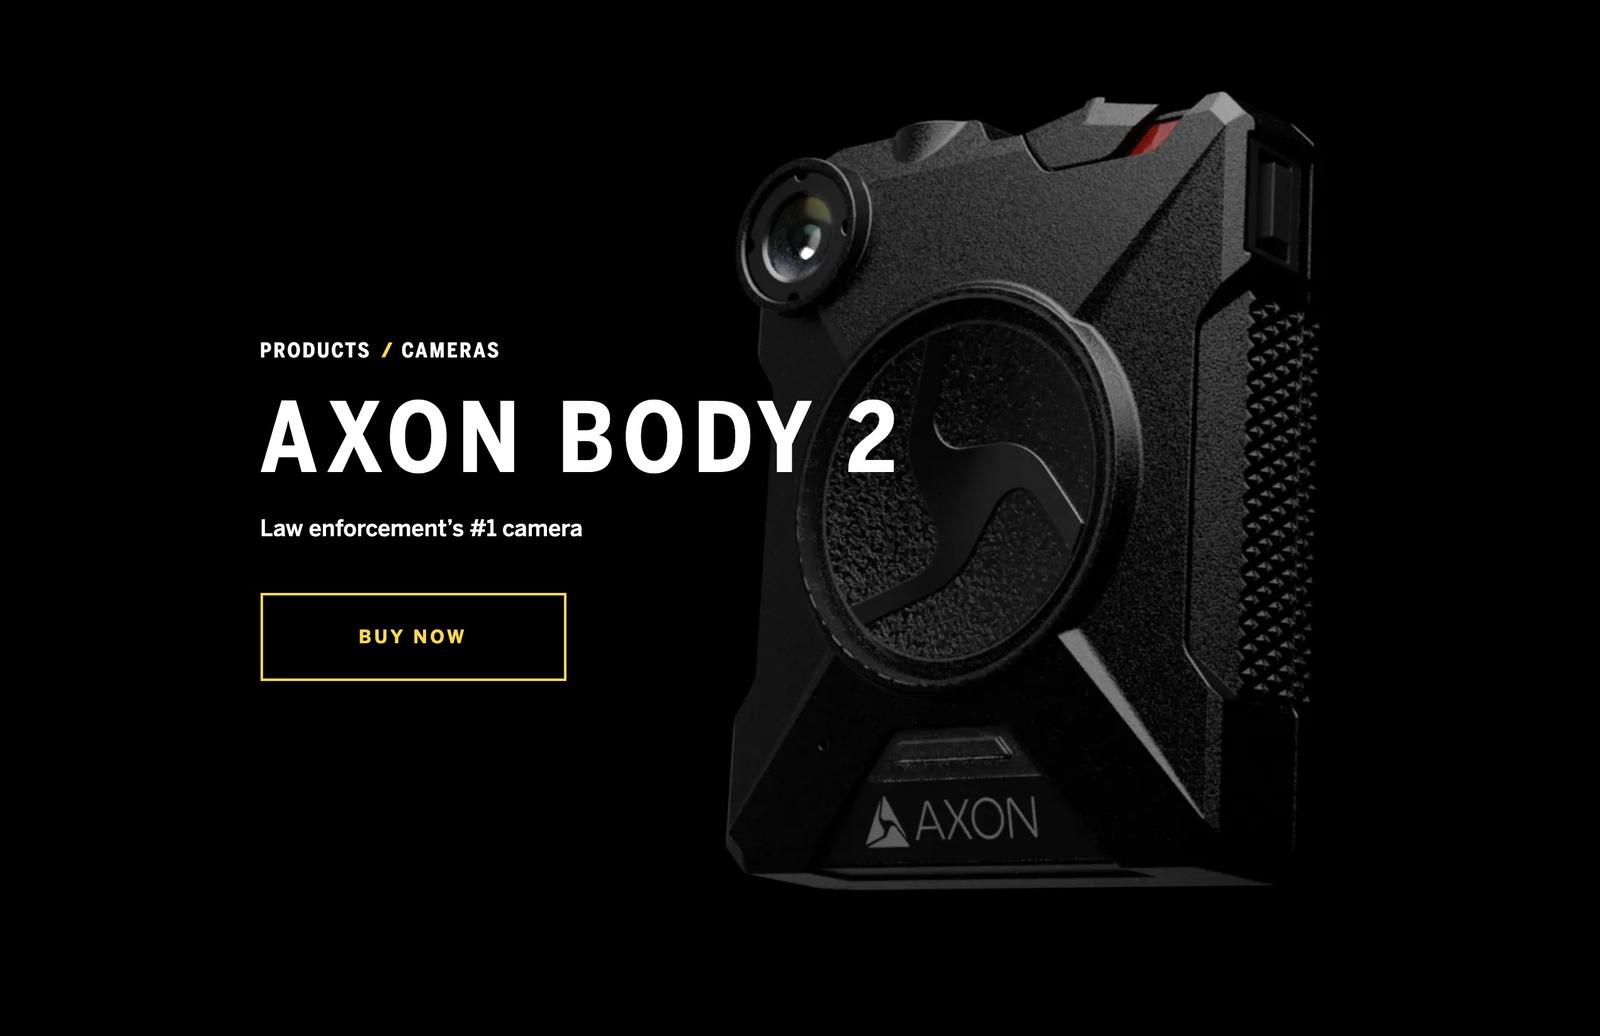 Axon body 2 1